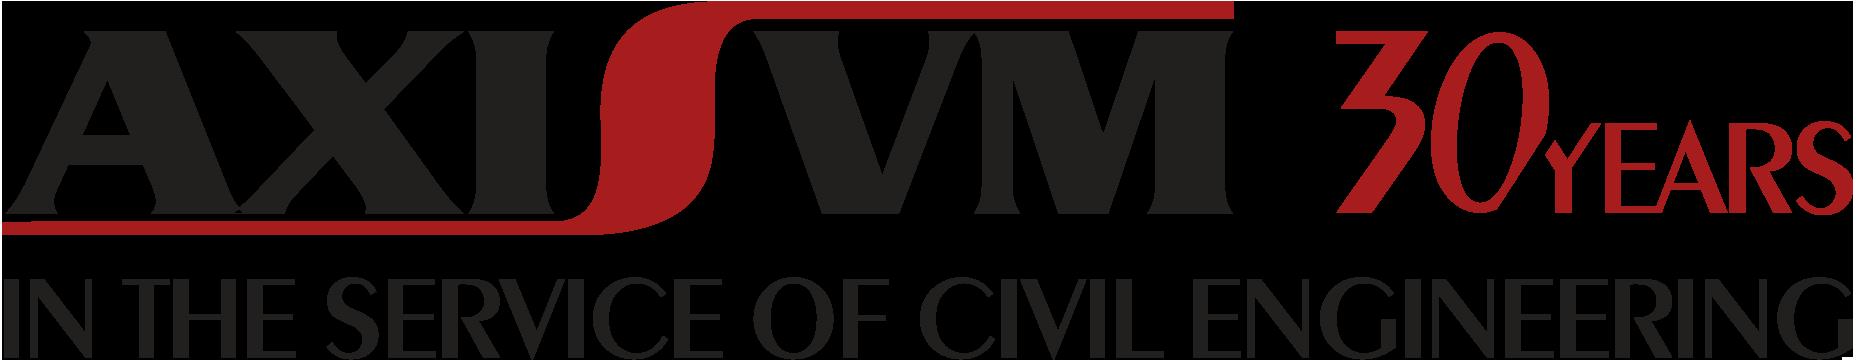 AxisVM_30years_anniversary_logo_1857x360_Tamas